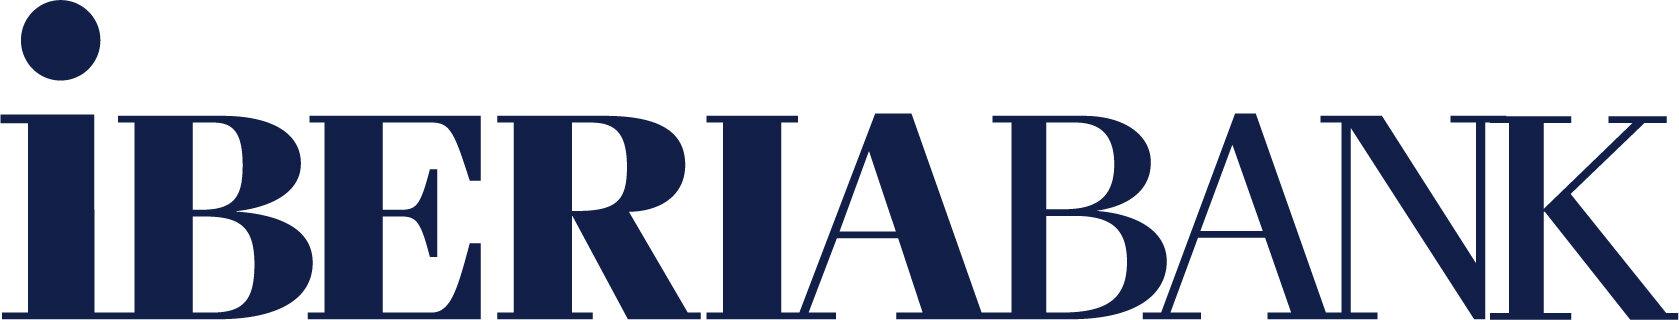 IB logo blue (1).jpg